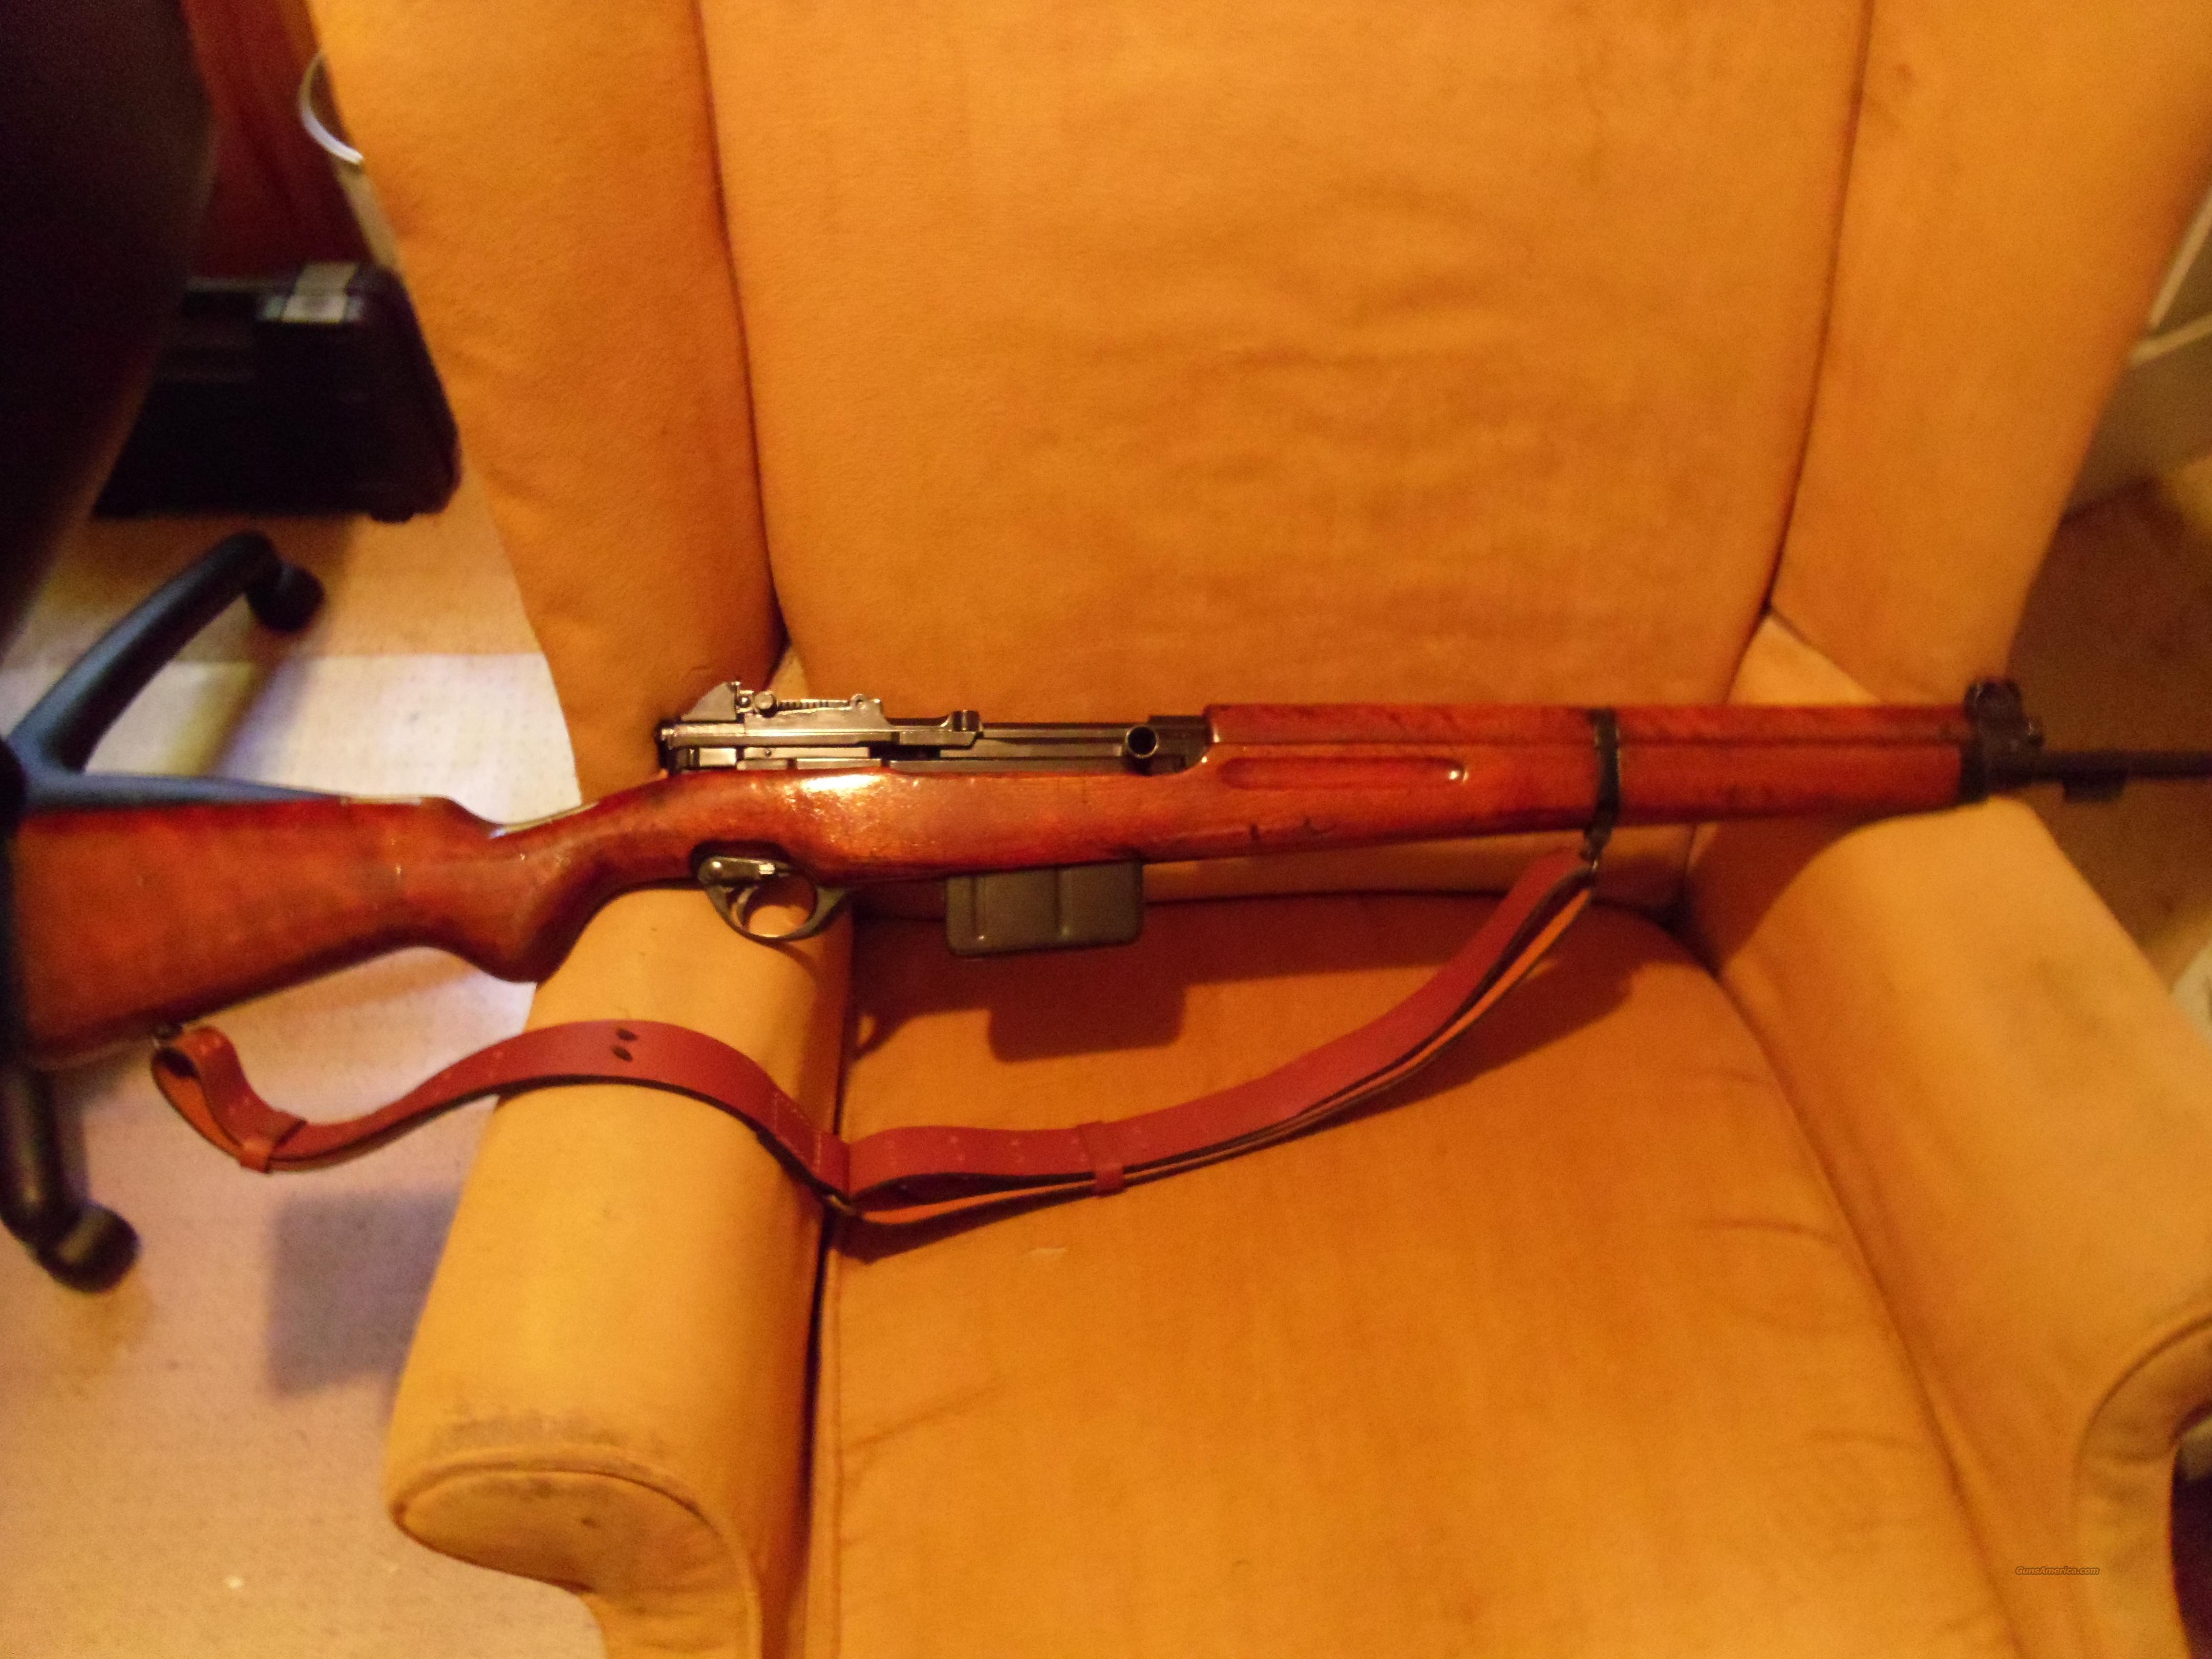 SAFN-FN-49  Guns > Rifles > FNH - Fabrique Nationale (FN) Rifles > Semi-auto > Other